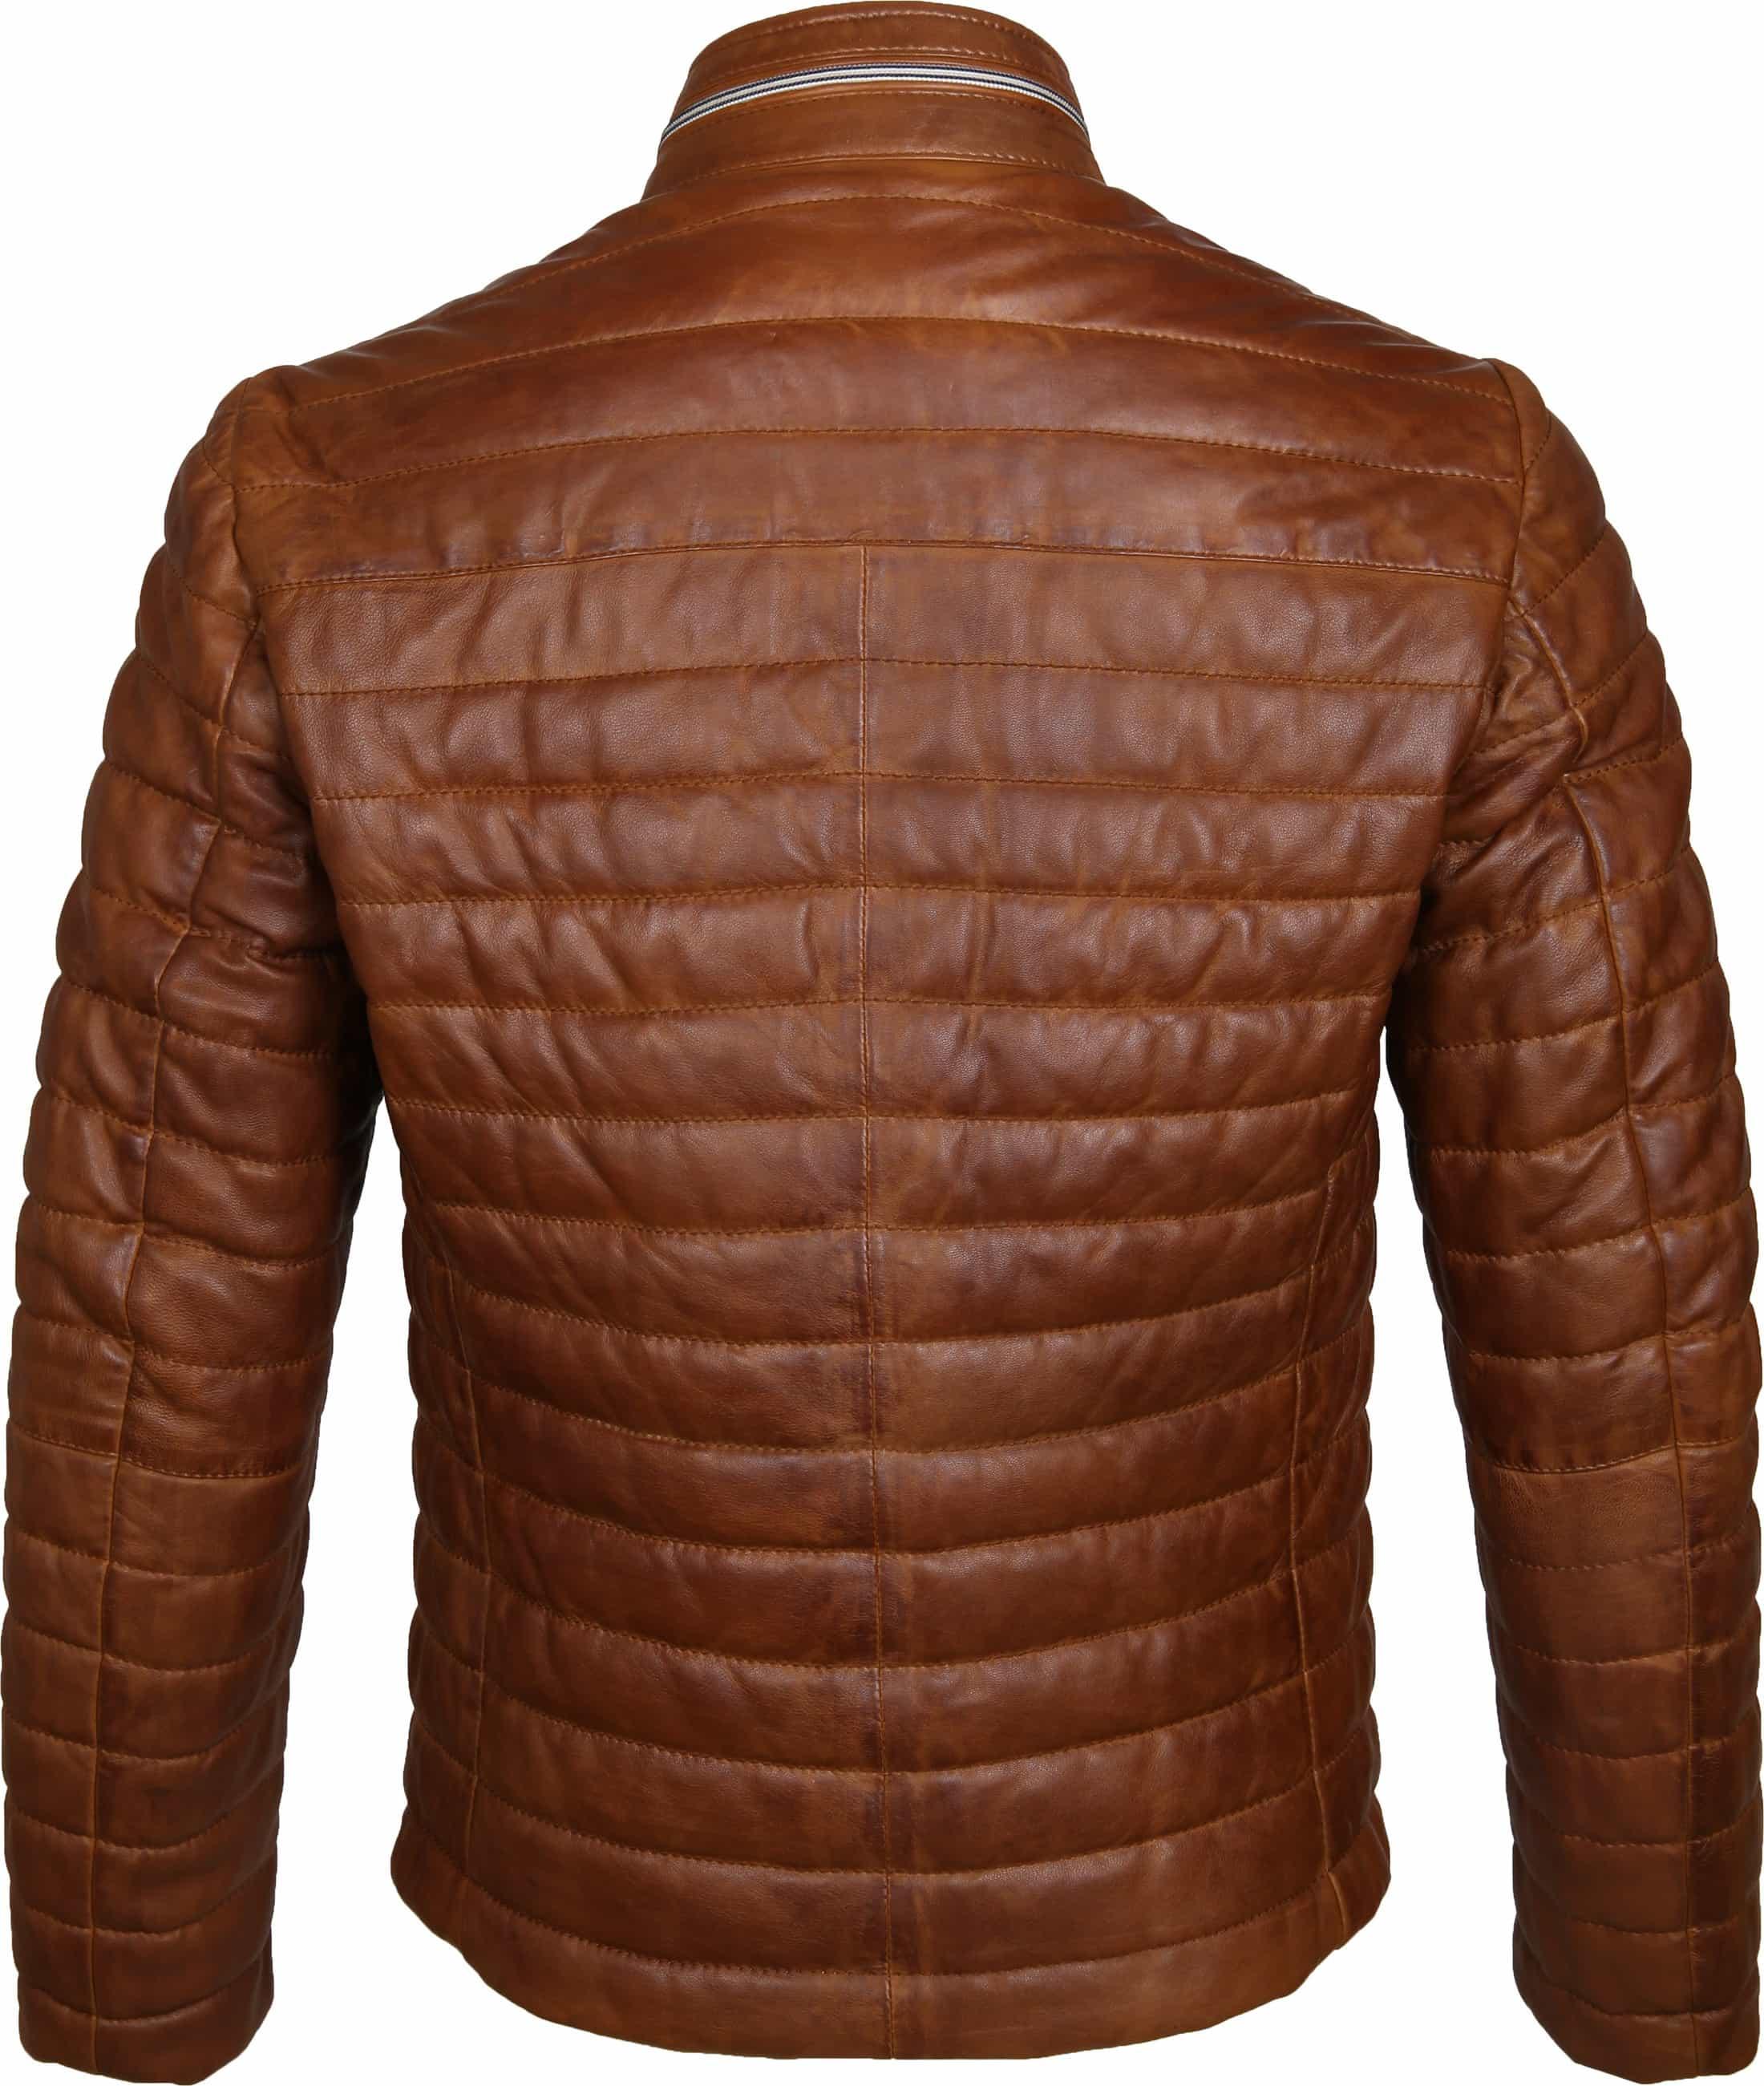 Milestone Tereno Leather Jacket Cognac foto 5